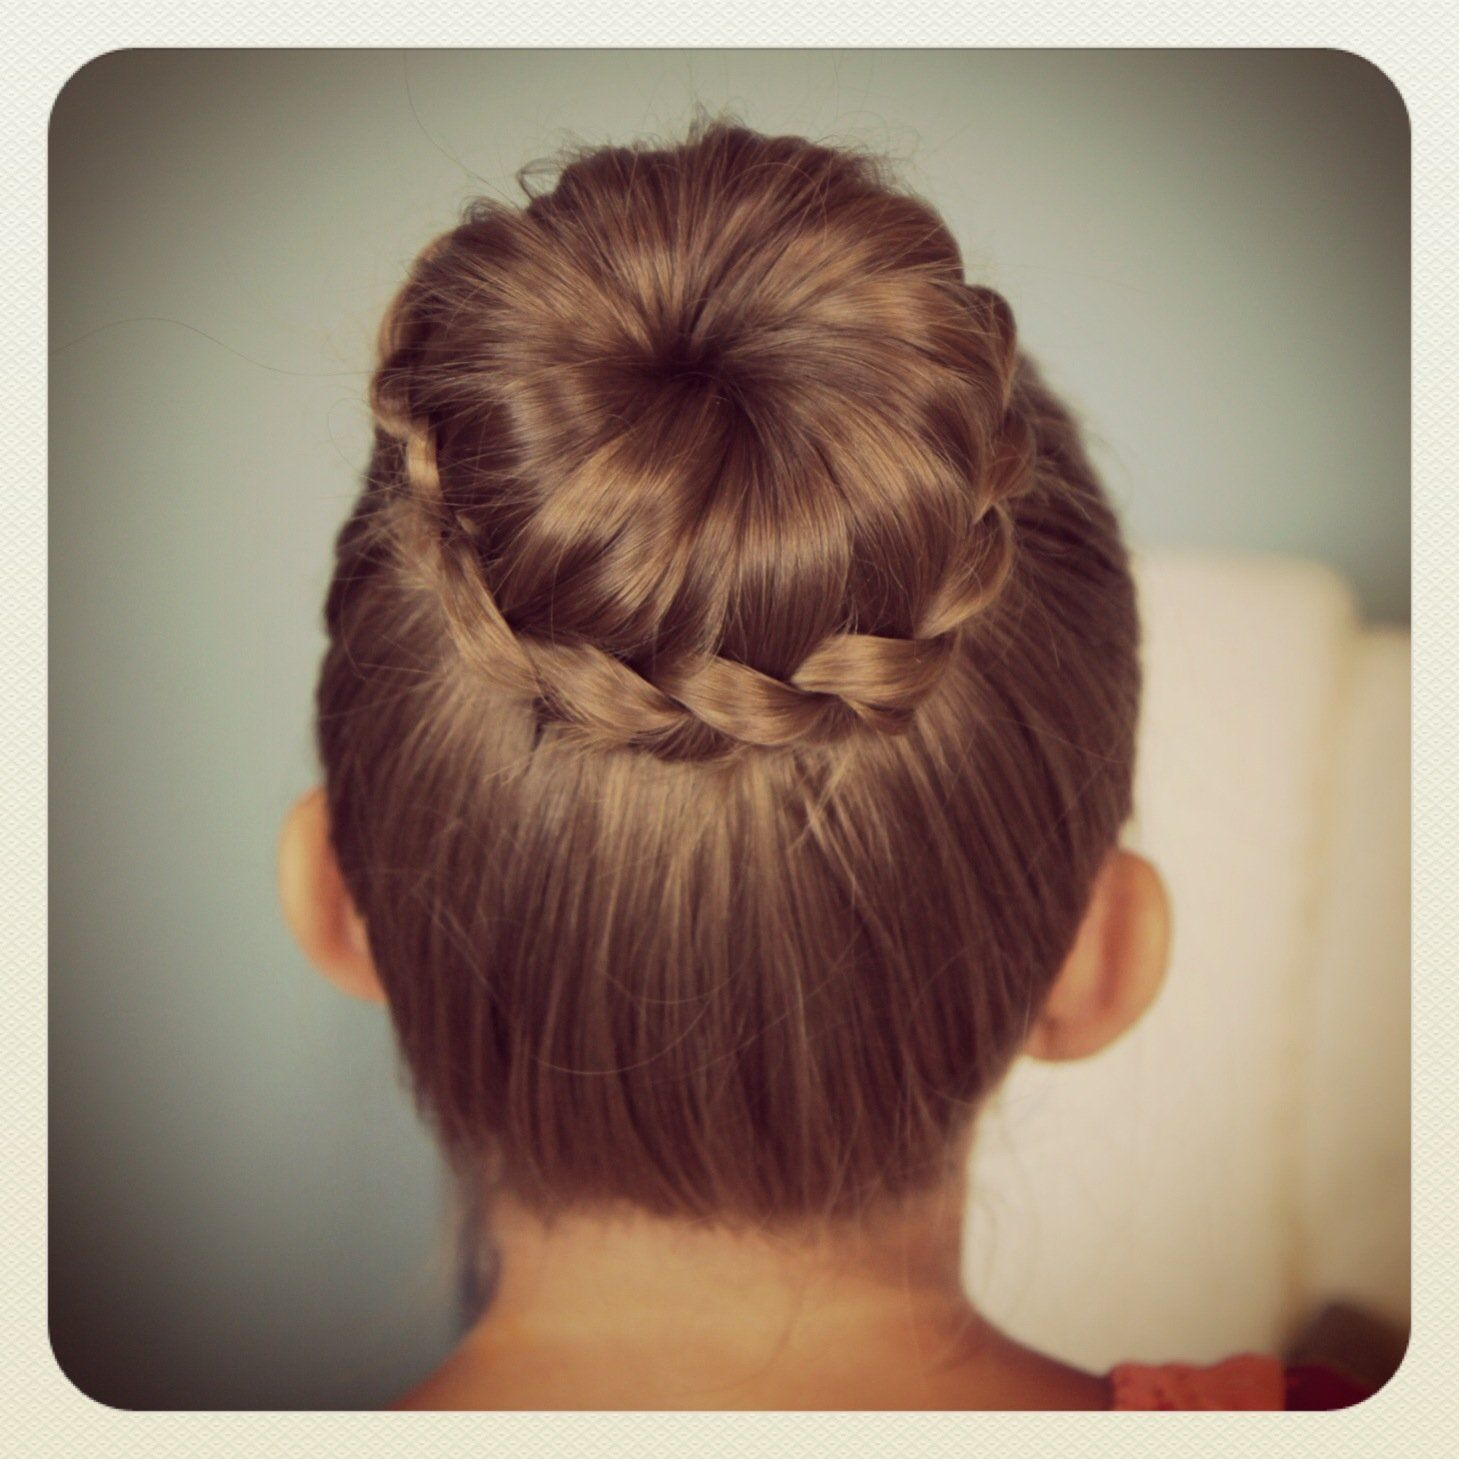 flower girl french braid hairstyles | lace braided bun | cute updo